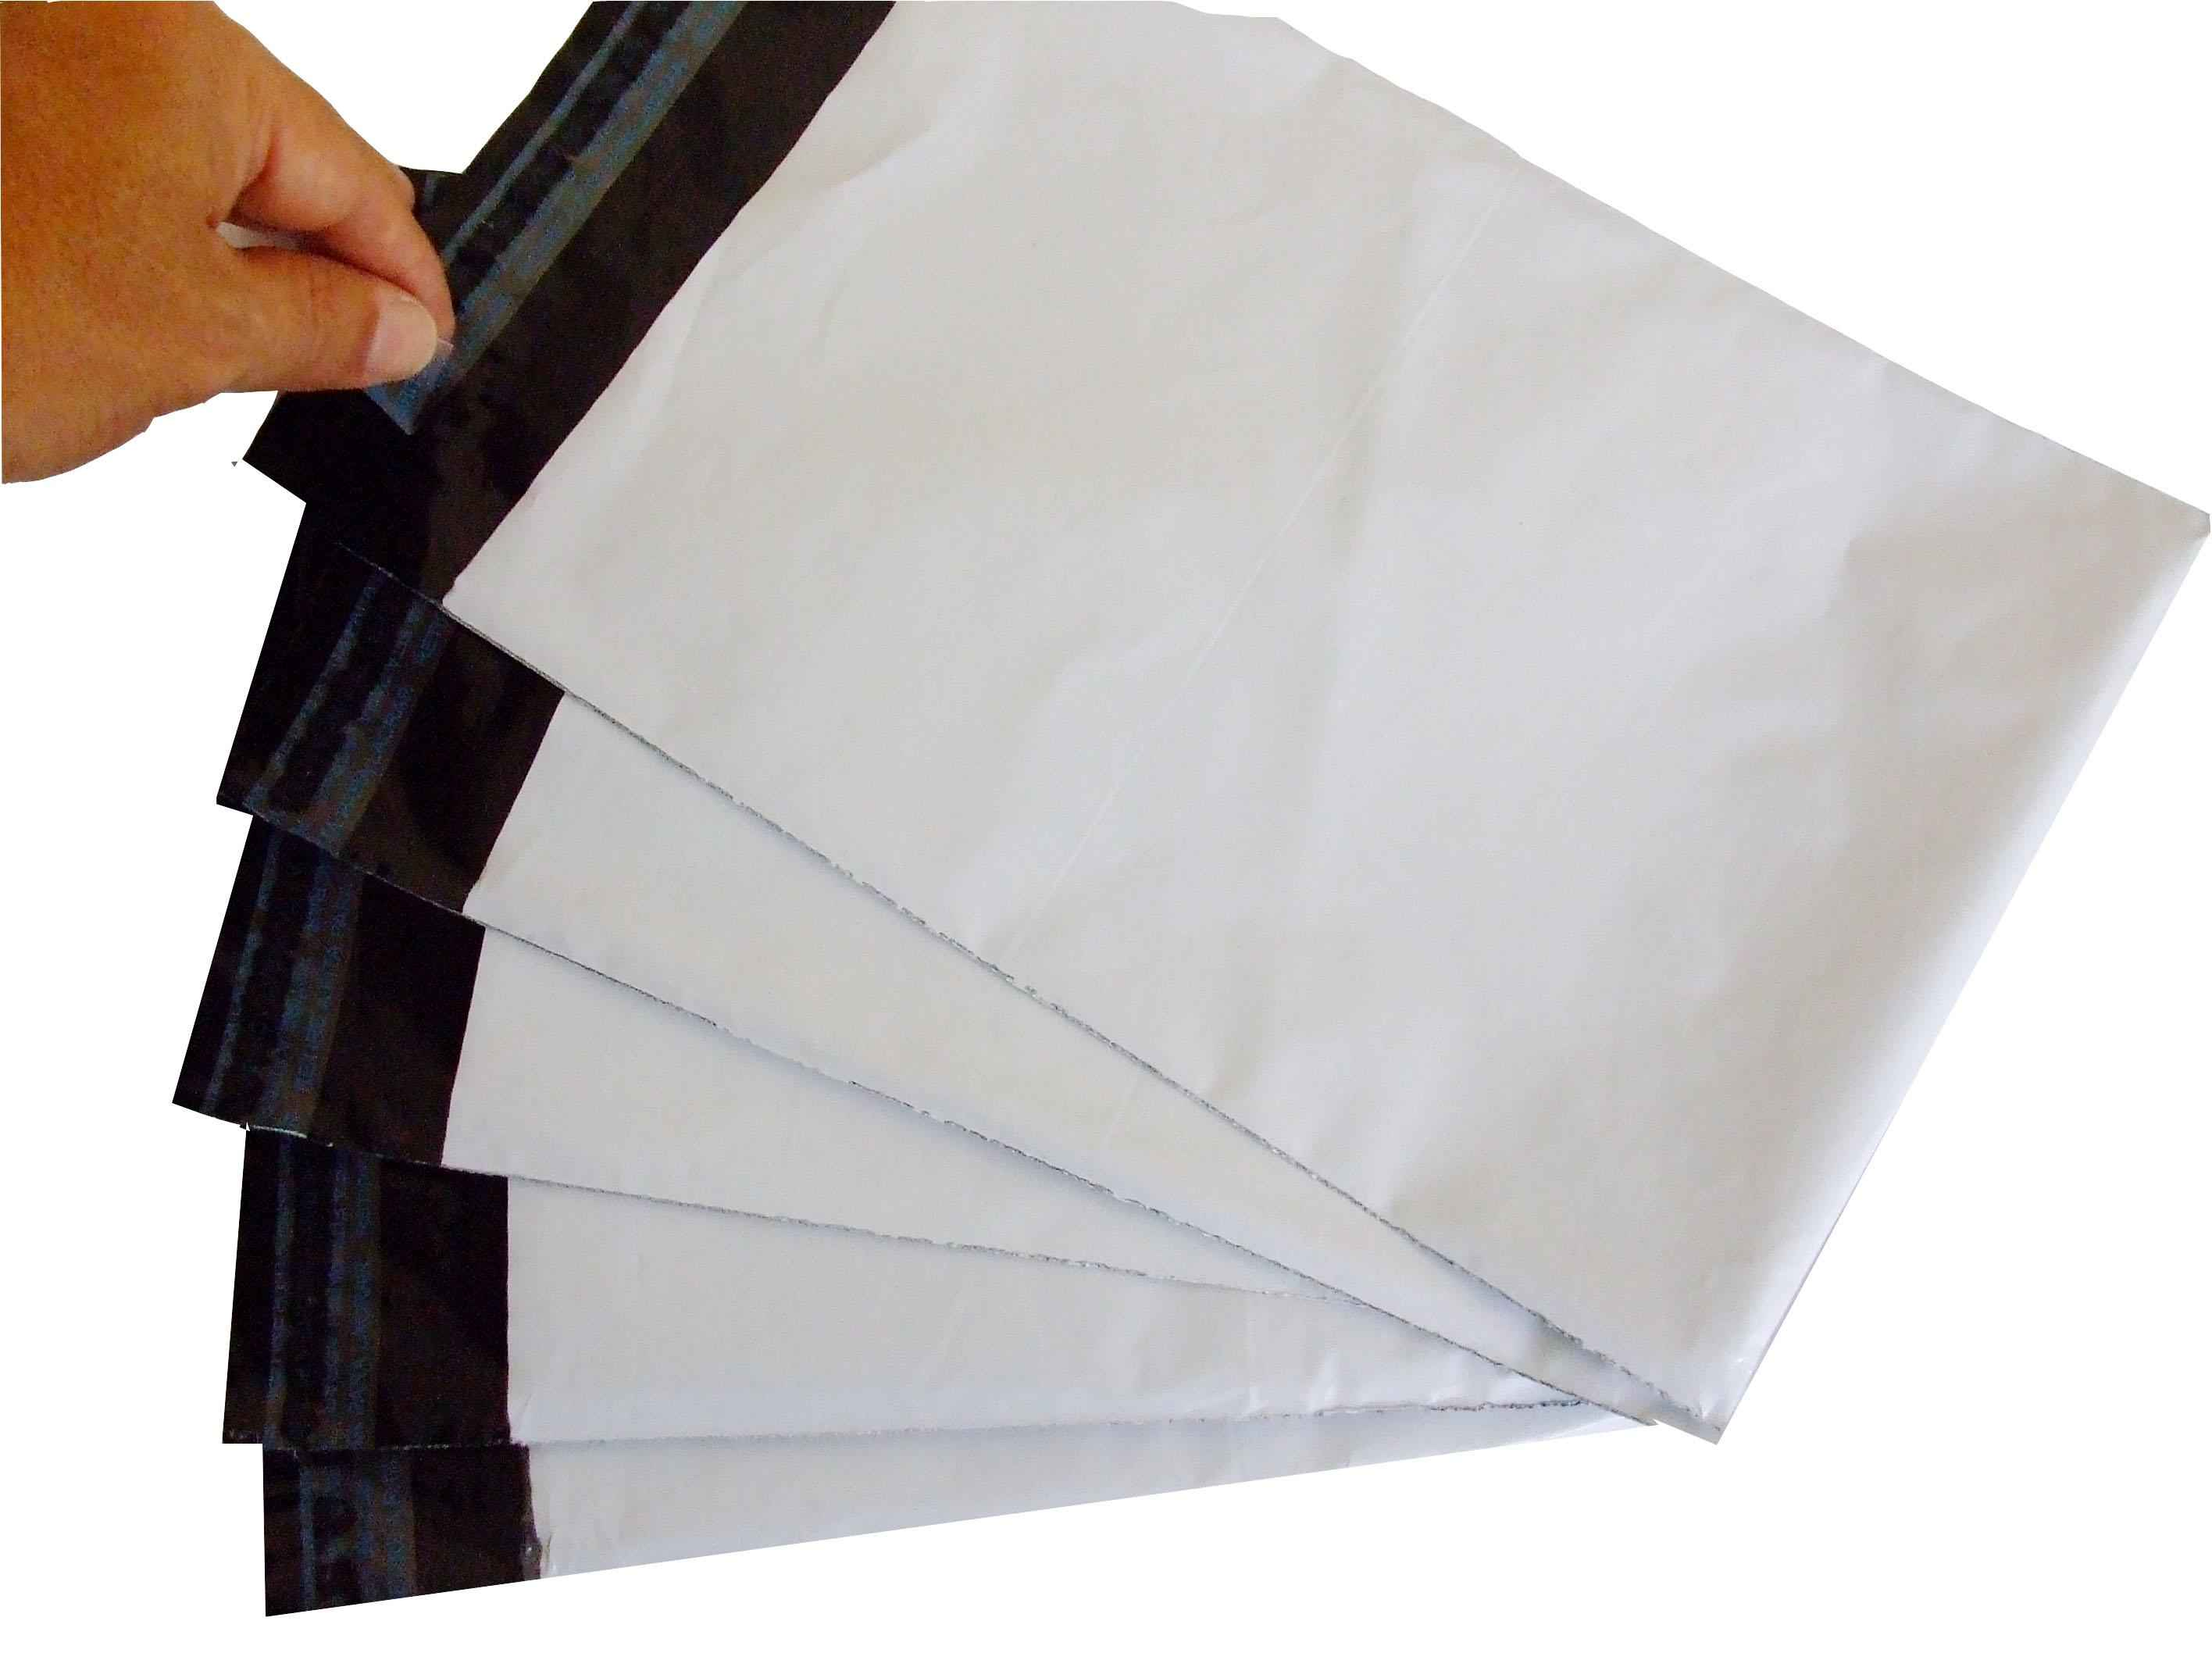 Envelope adesivo personalizado em plástico